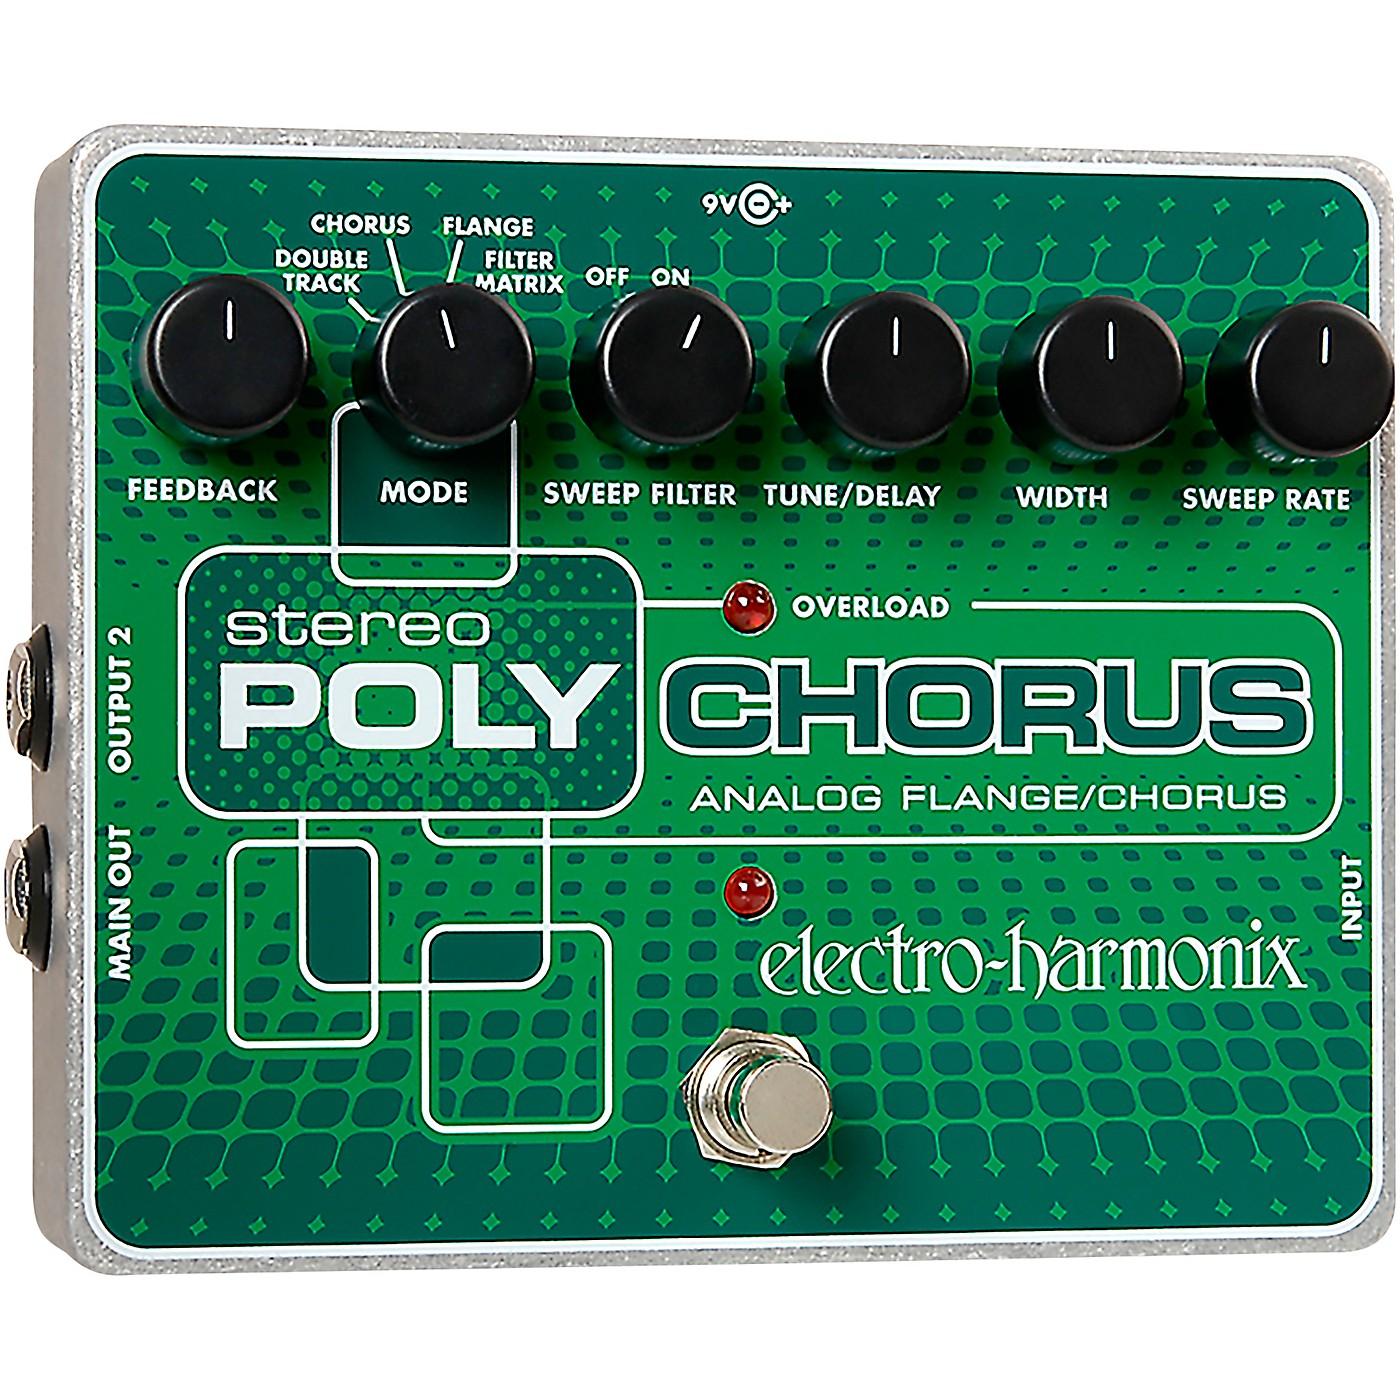 Electro-Harmonix XO Stereo Polychorus Analog Flanger and Chorus Guitar Effects Pedal thumbnail